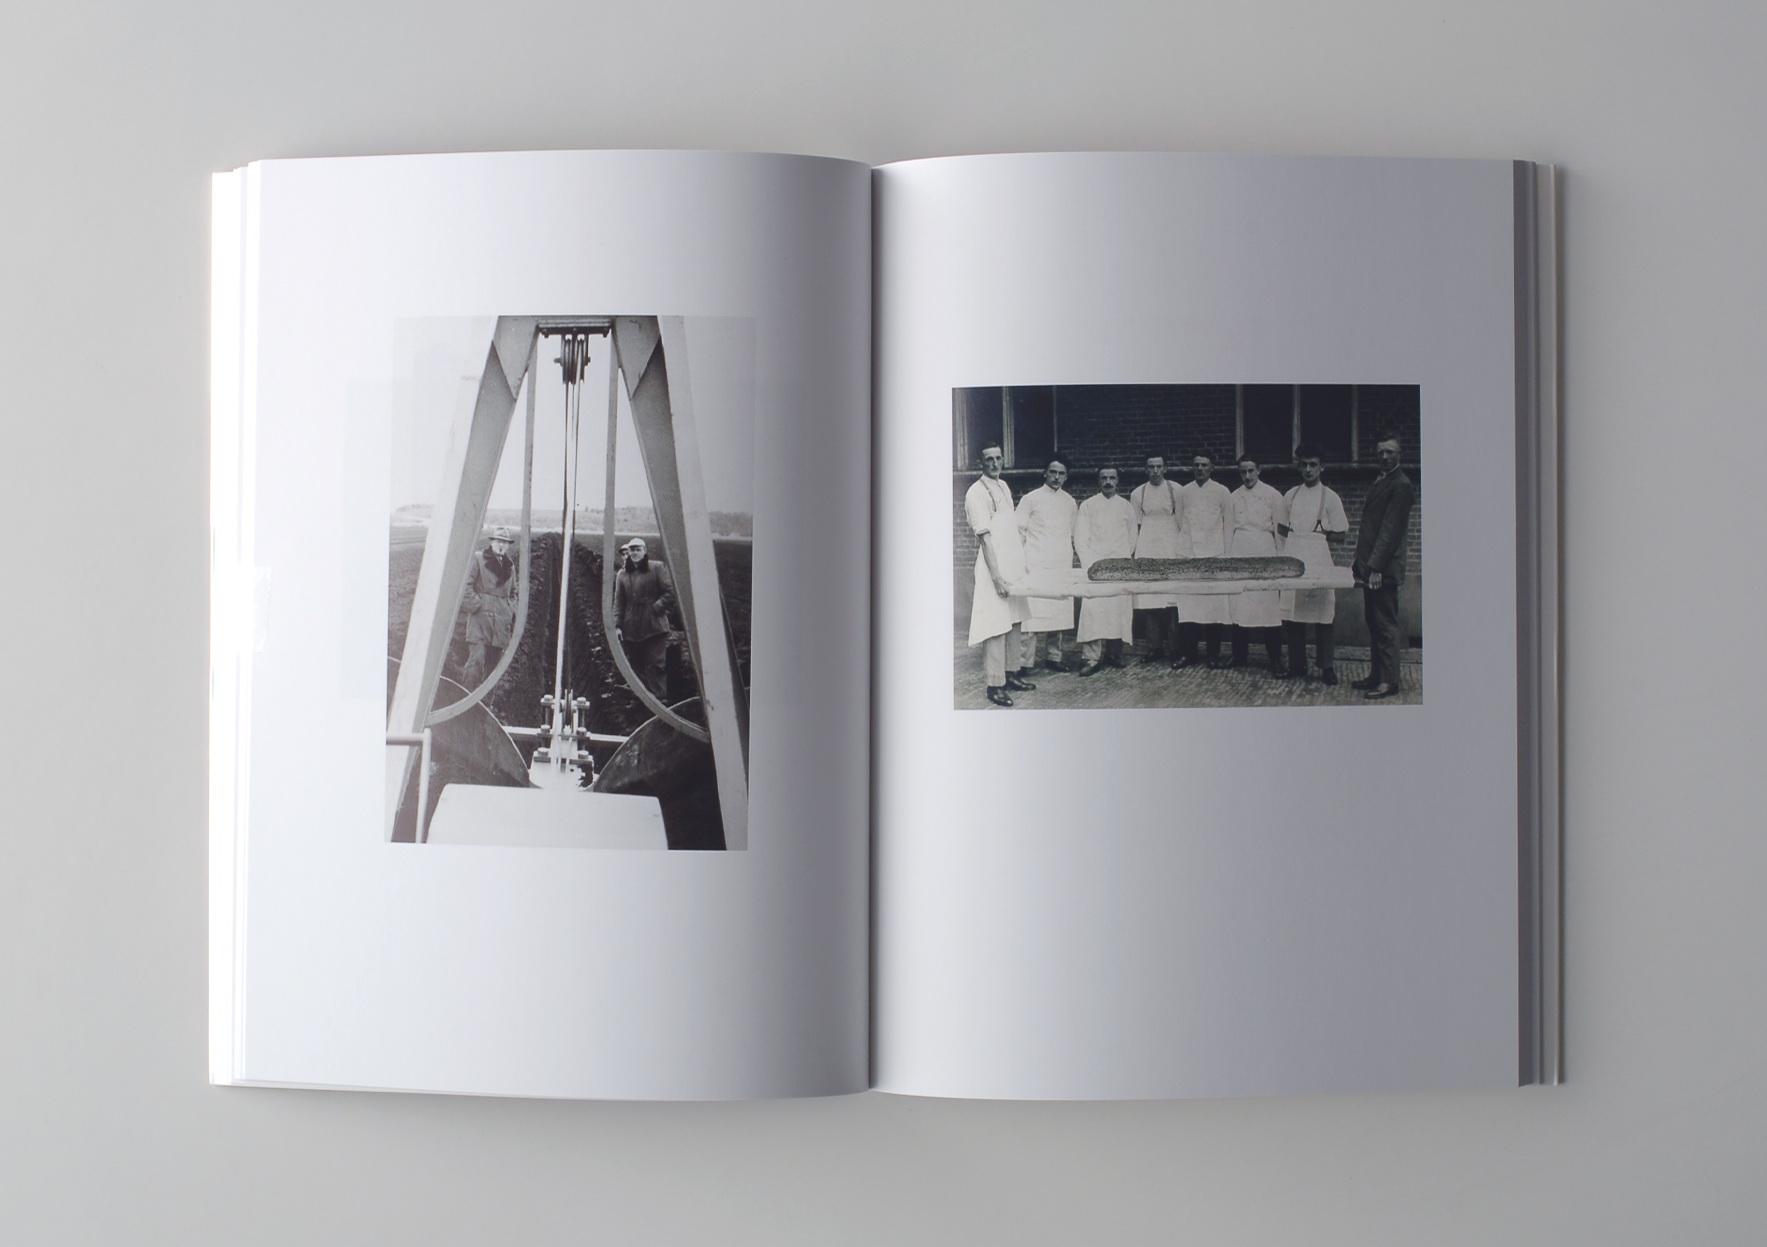   Nijverdal / Hellendoorn   ProjecteSD